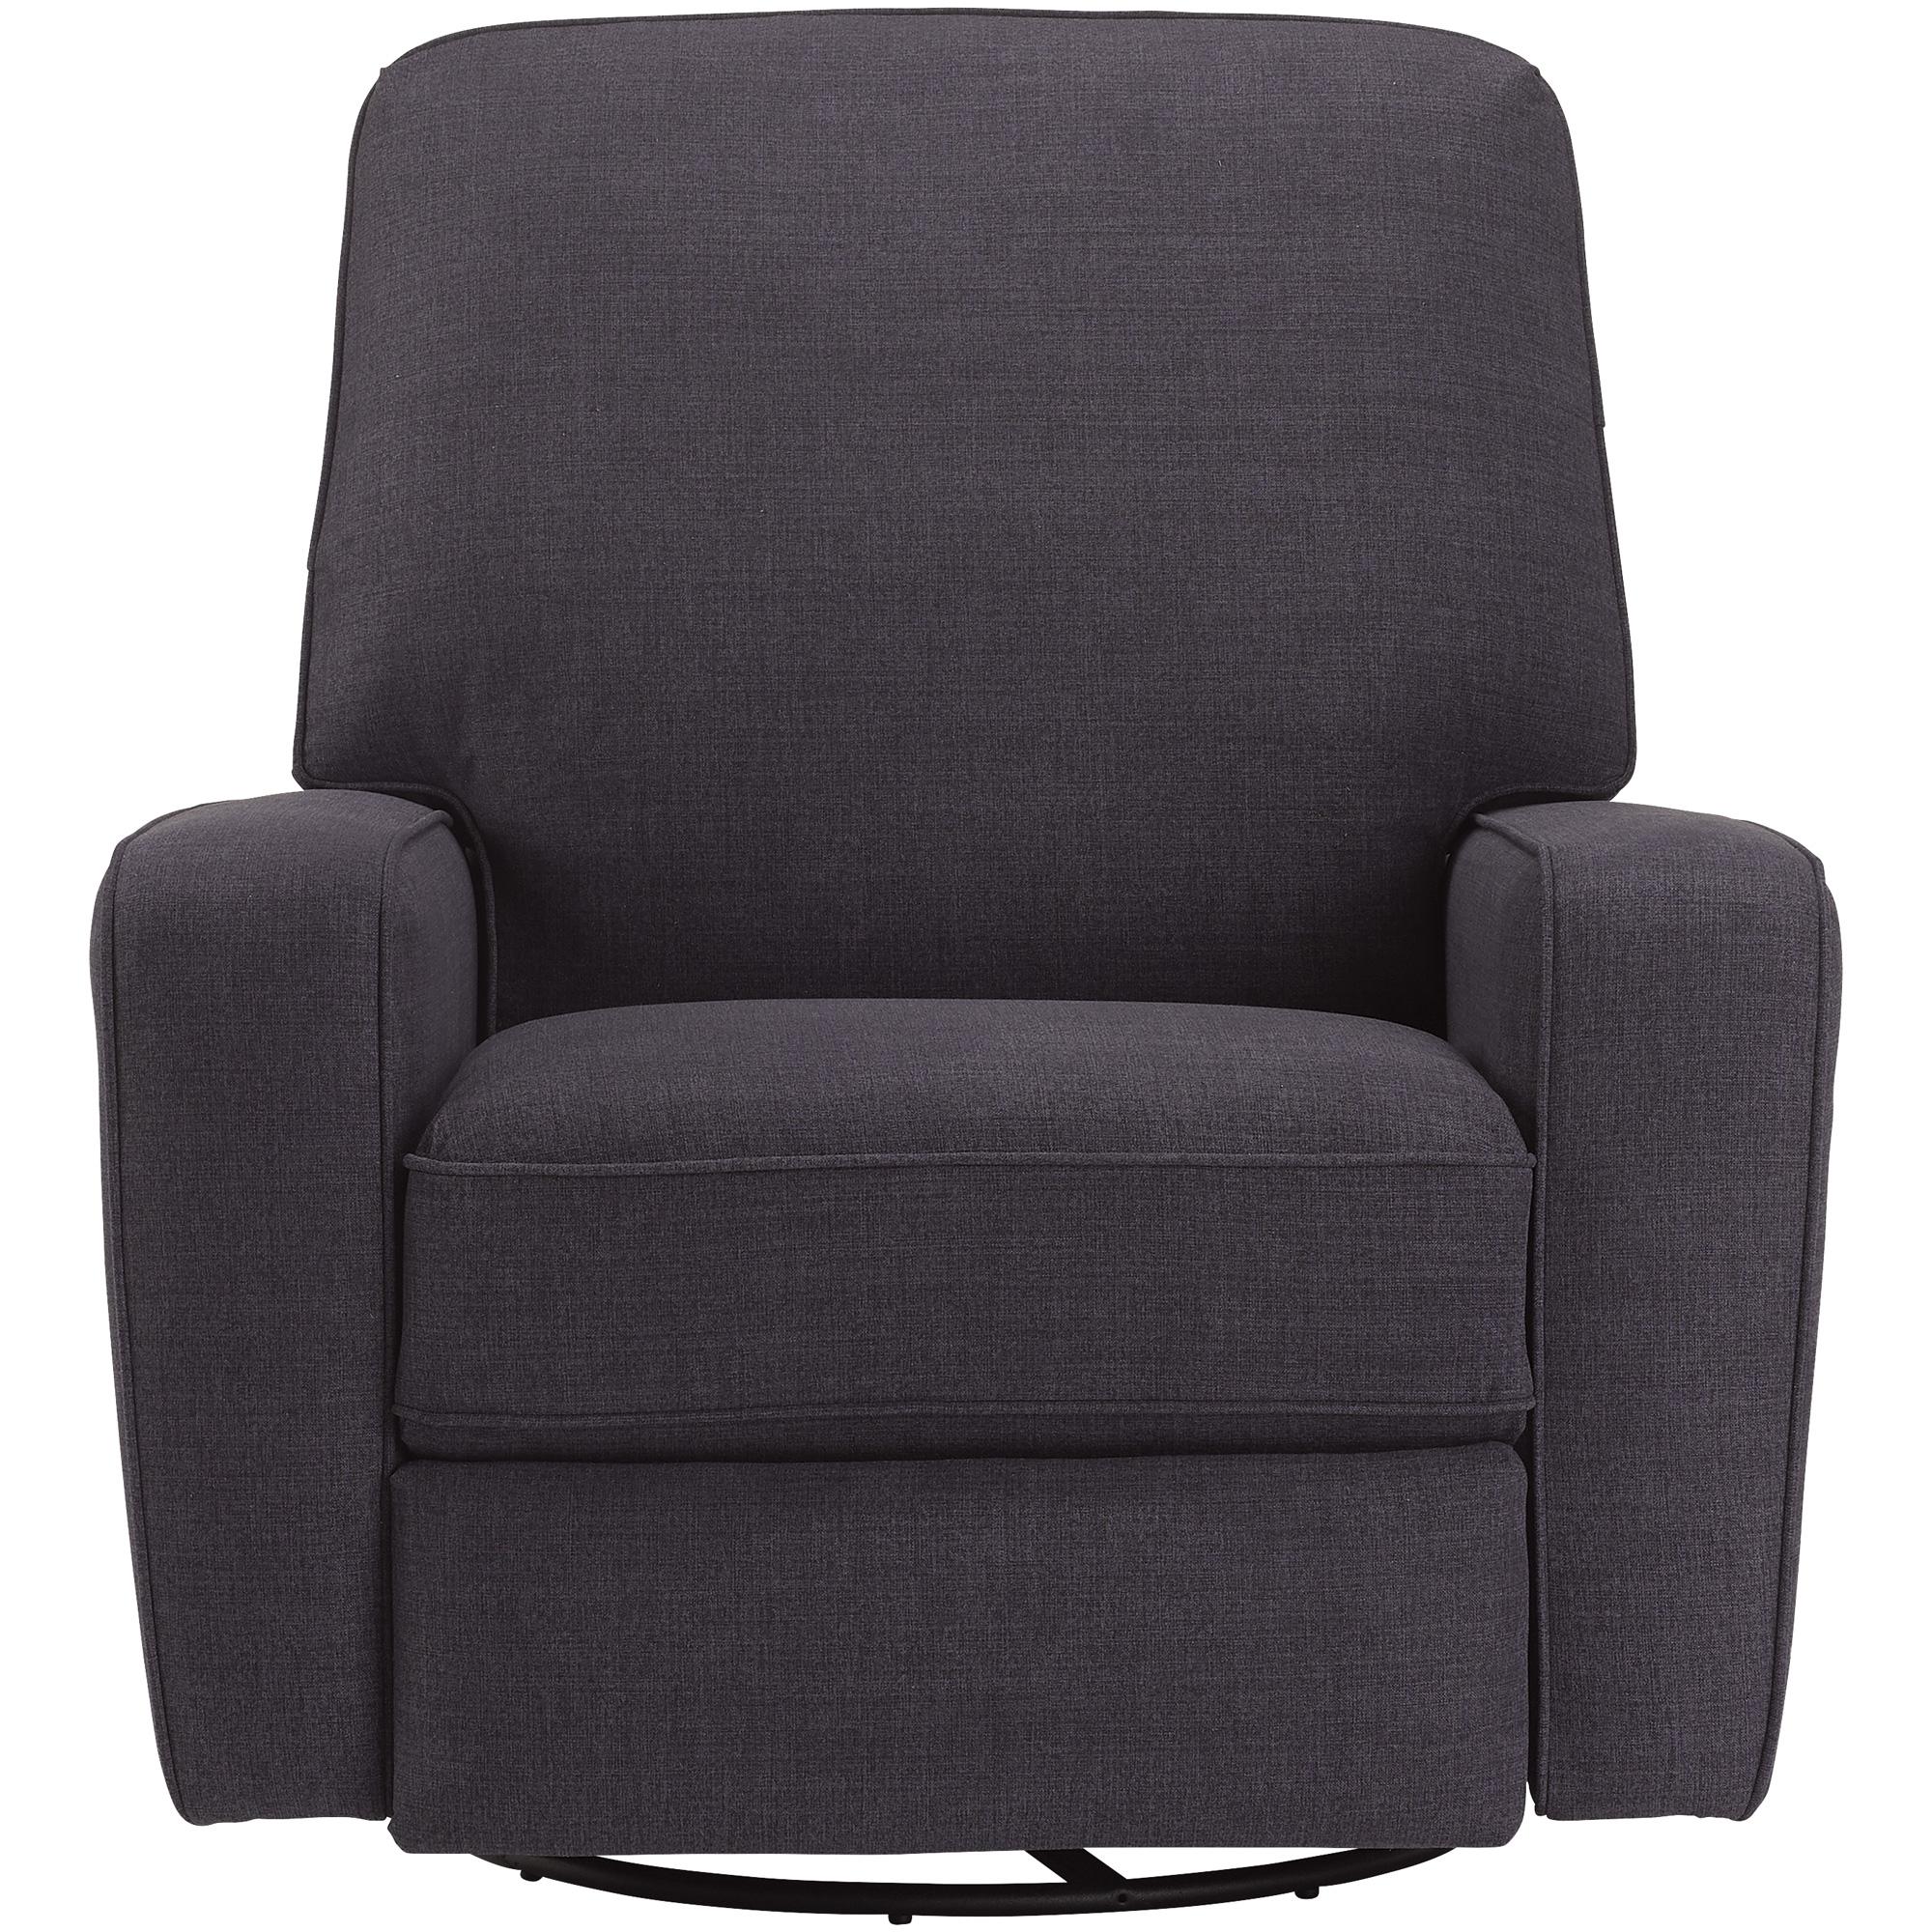 Best Home Furnishings | Bilana Navy Swivel Glide Recliner Chair